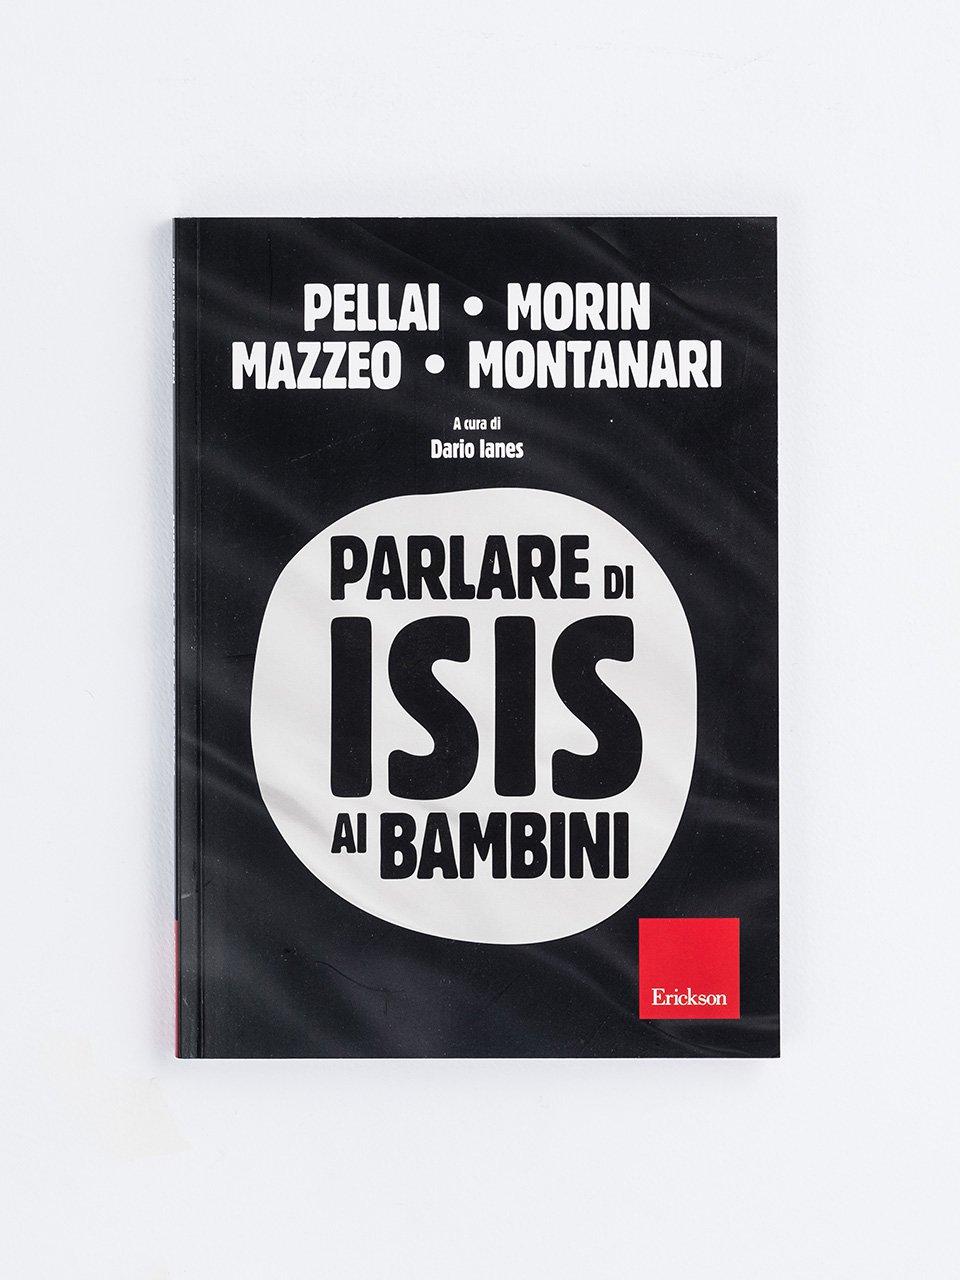 Parlare di ISIS ai bambini - Alberto Pellai - Erickson